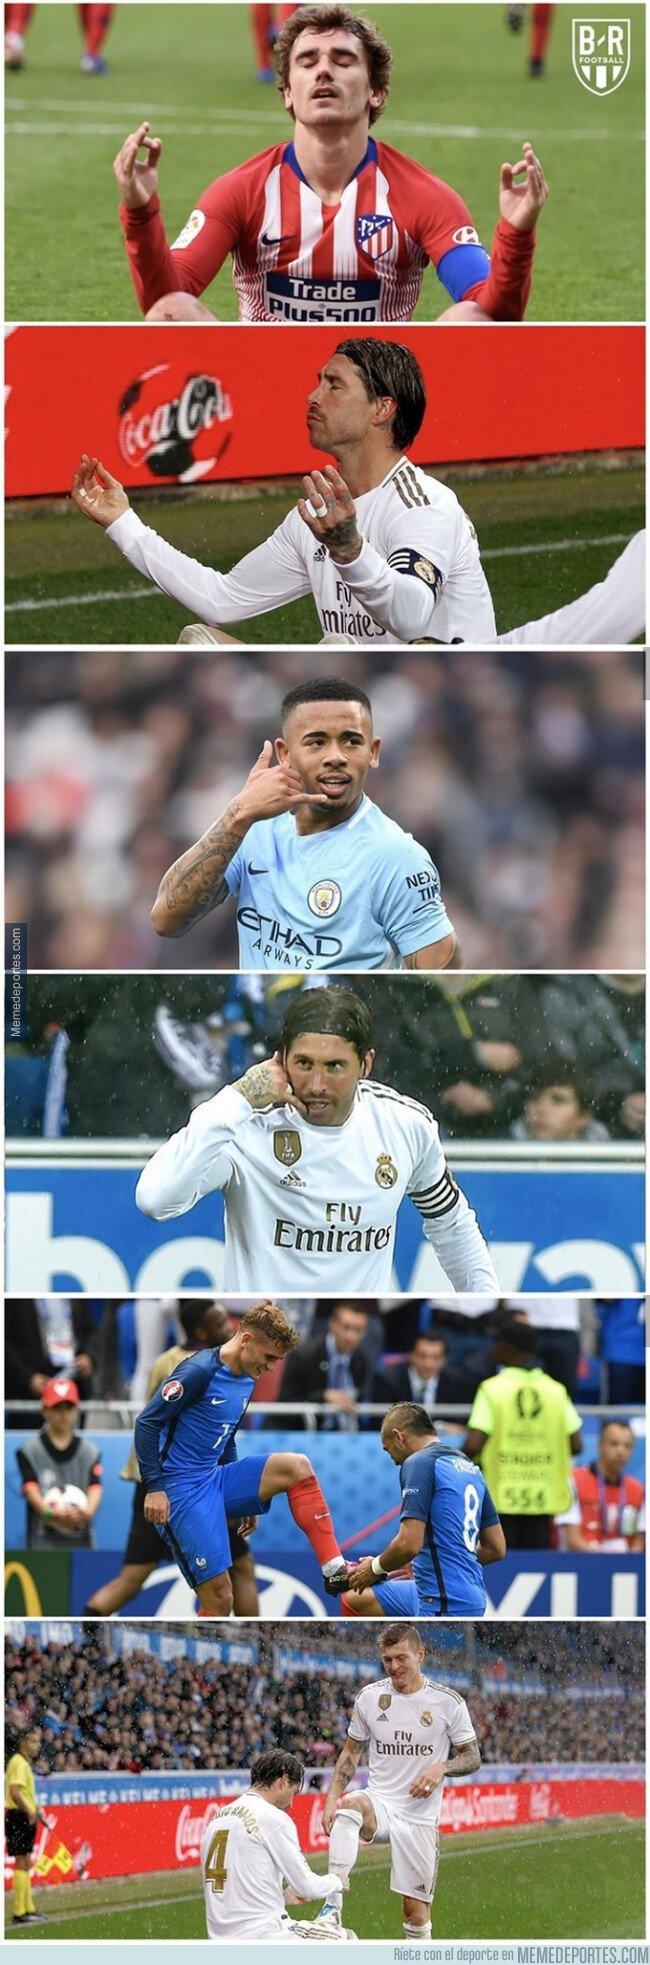 1092375 - A Ramos le gusta imitar celebraciones, por @brfootball